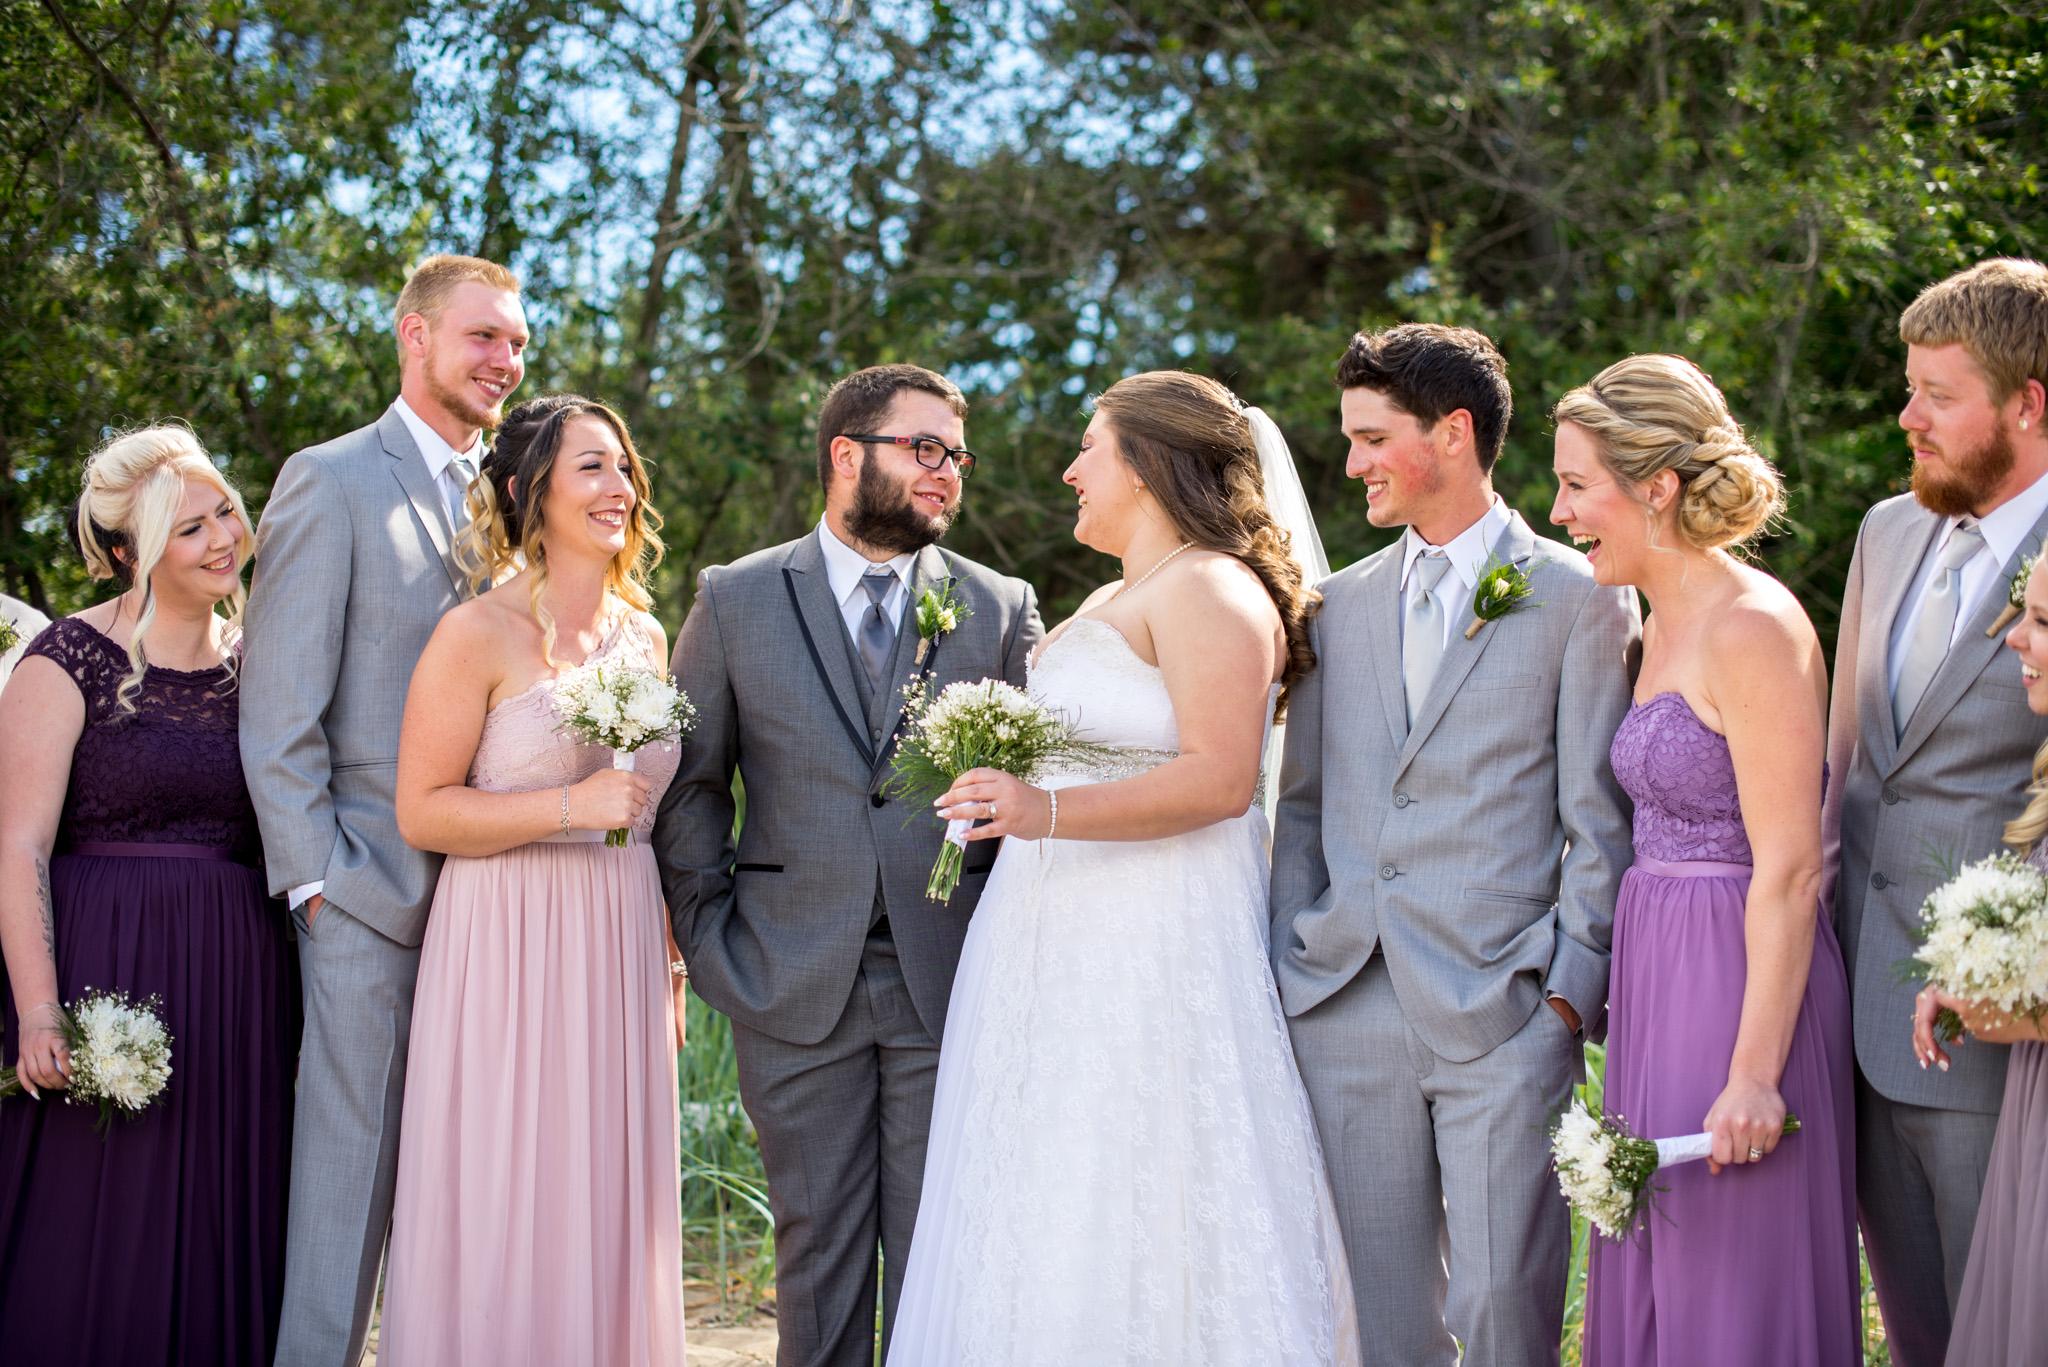 Powell River Wedding Photographer-112.jpg